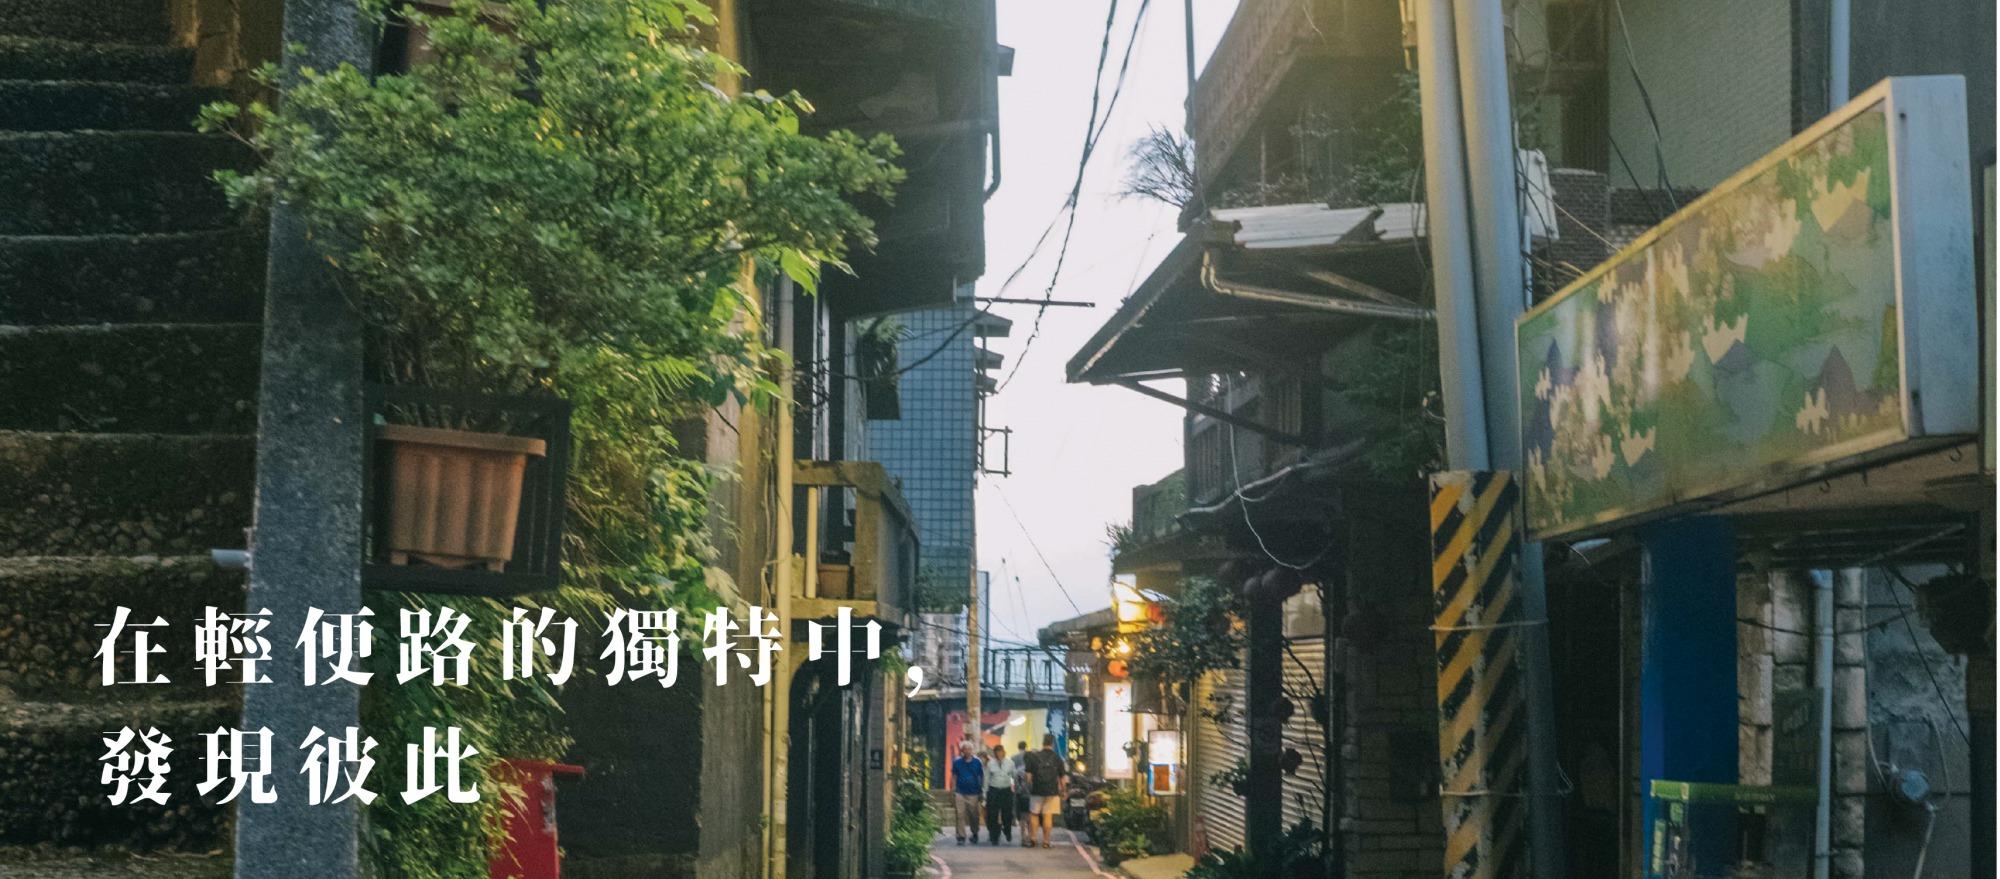 九份四條路線banner1107-04.jpg